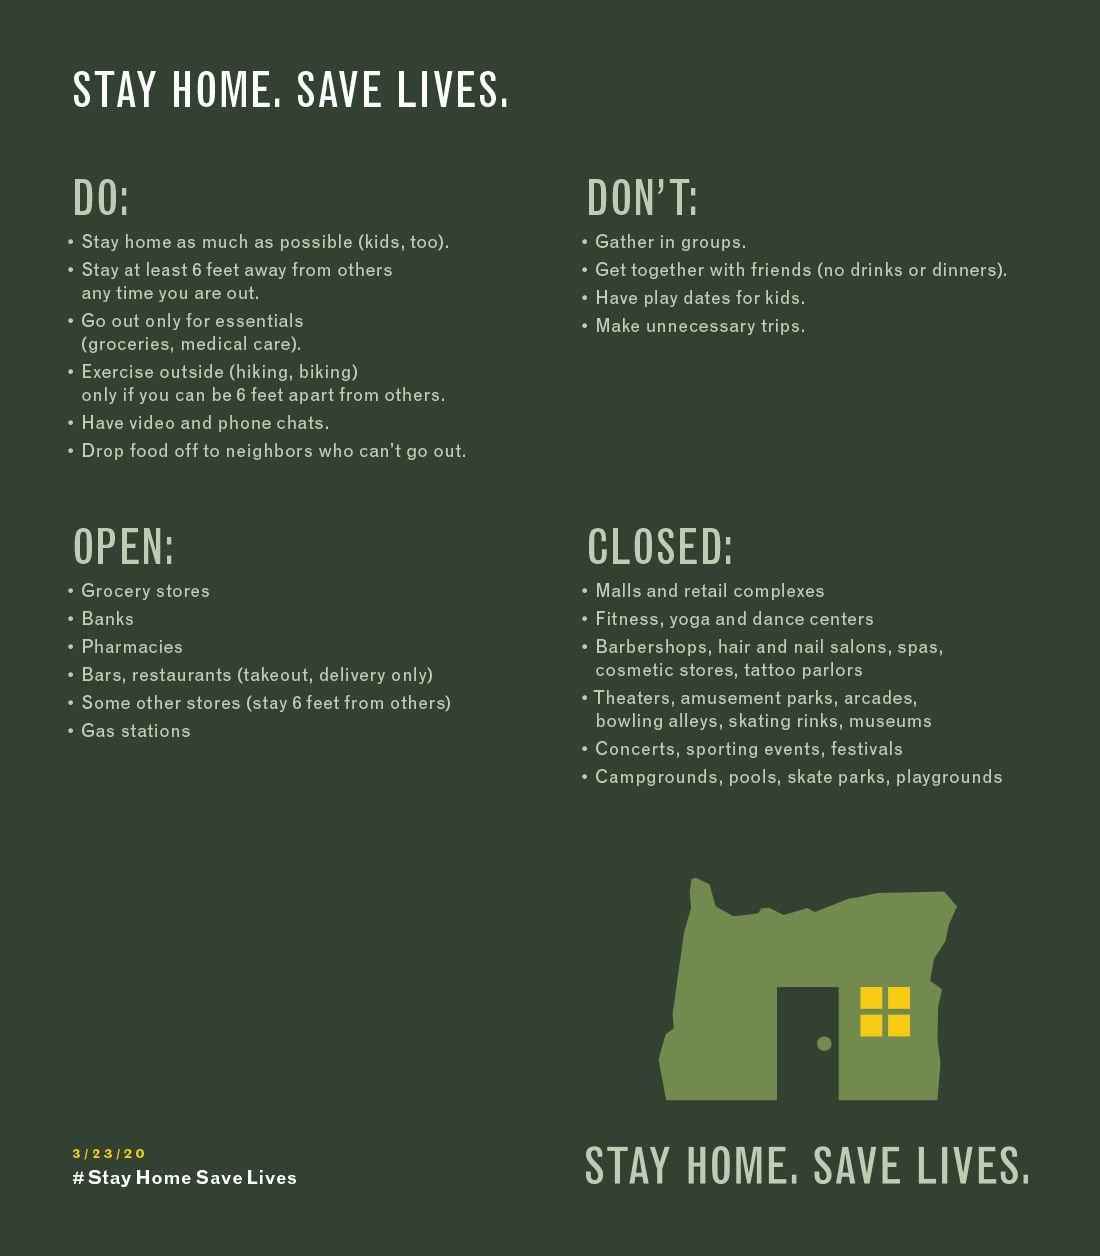 stay-home-save-lives-1-shareable_original.jpg